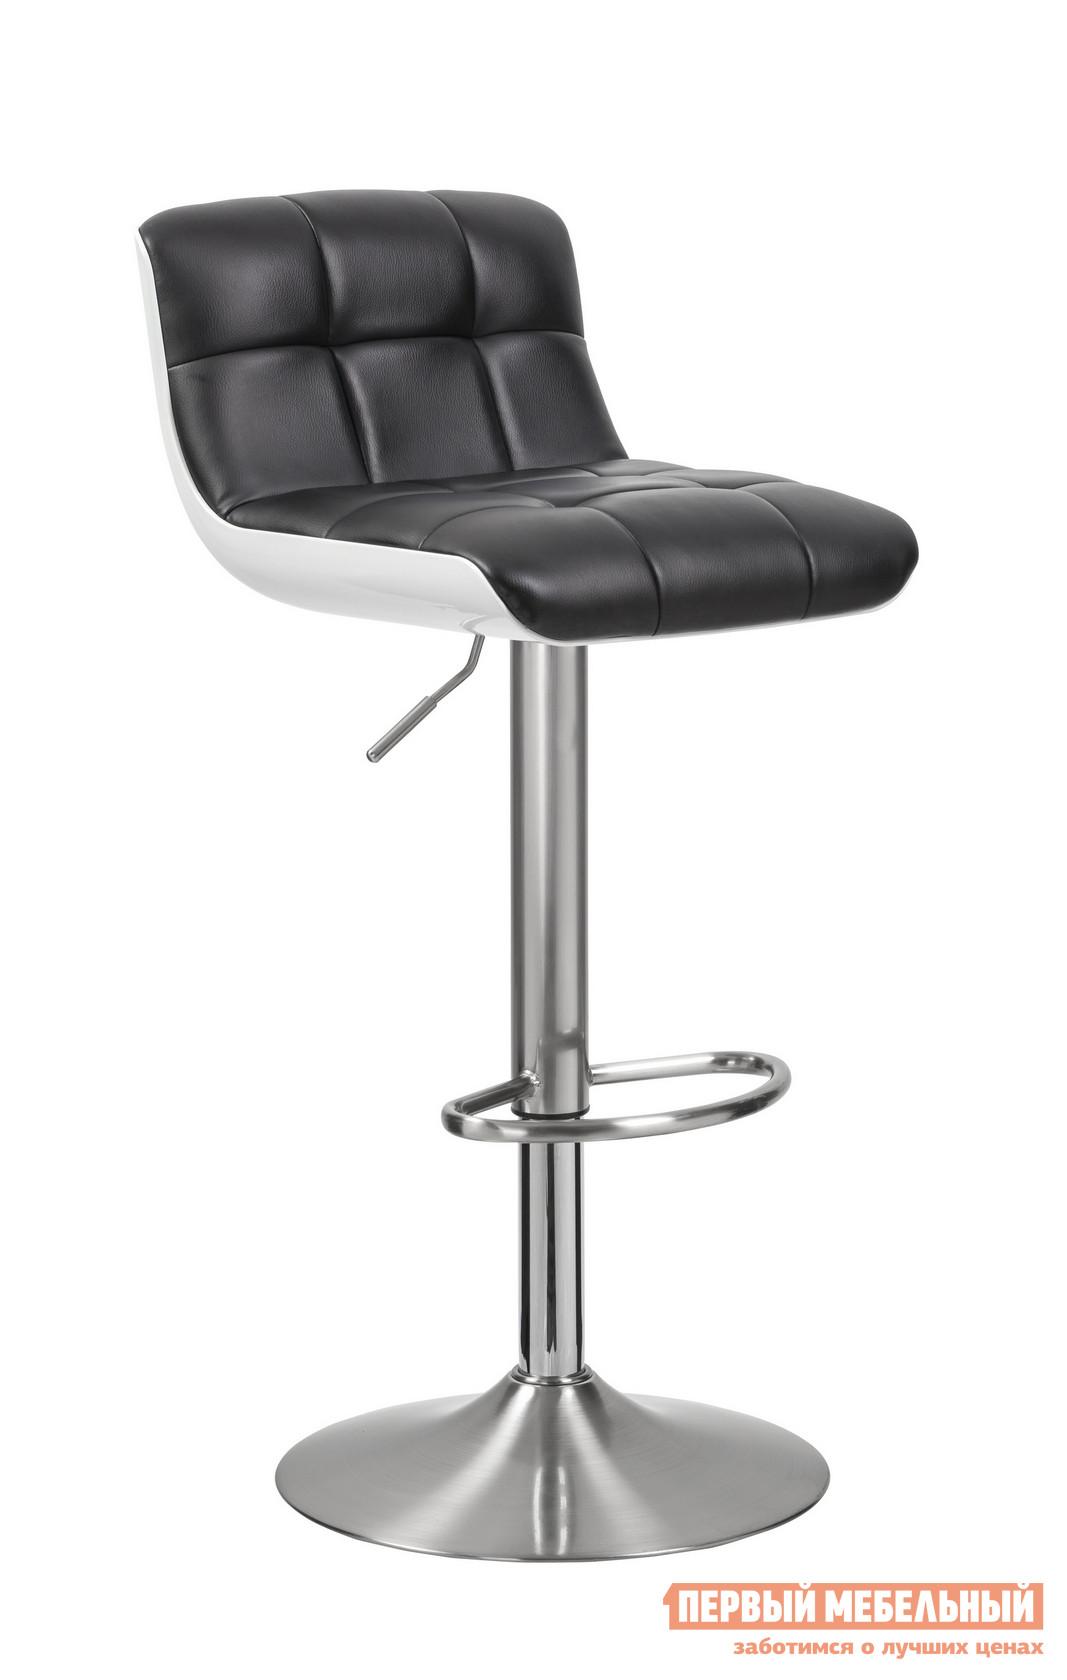 Барный стул Red and Black 205Q-WY барный стул red and black 199а wy